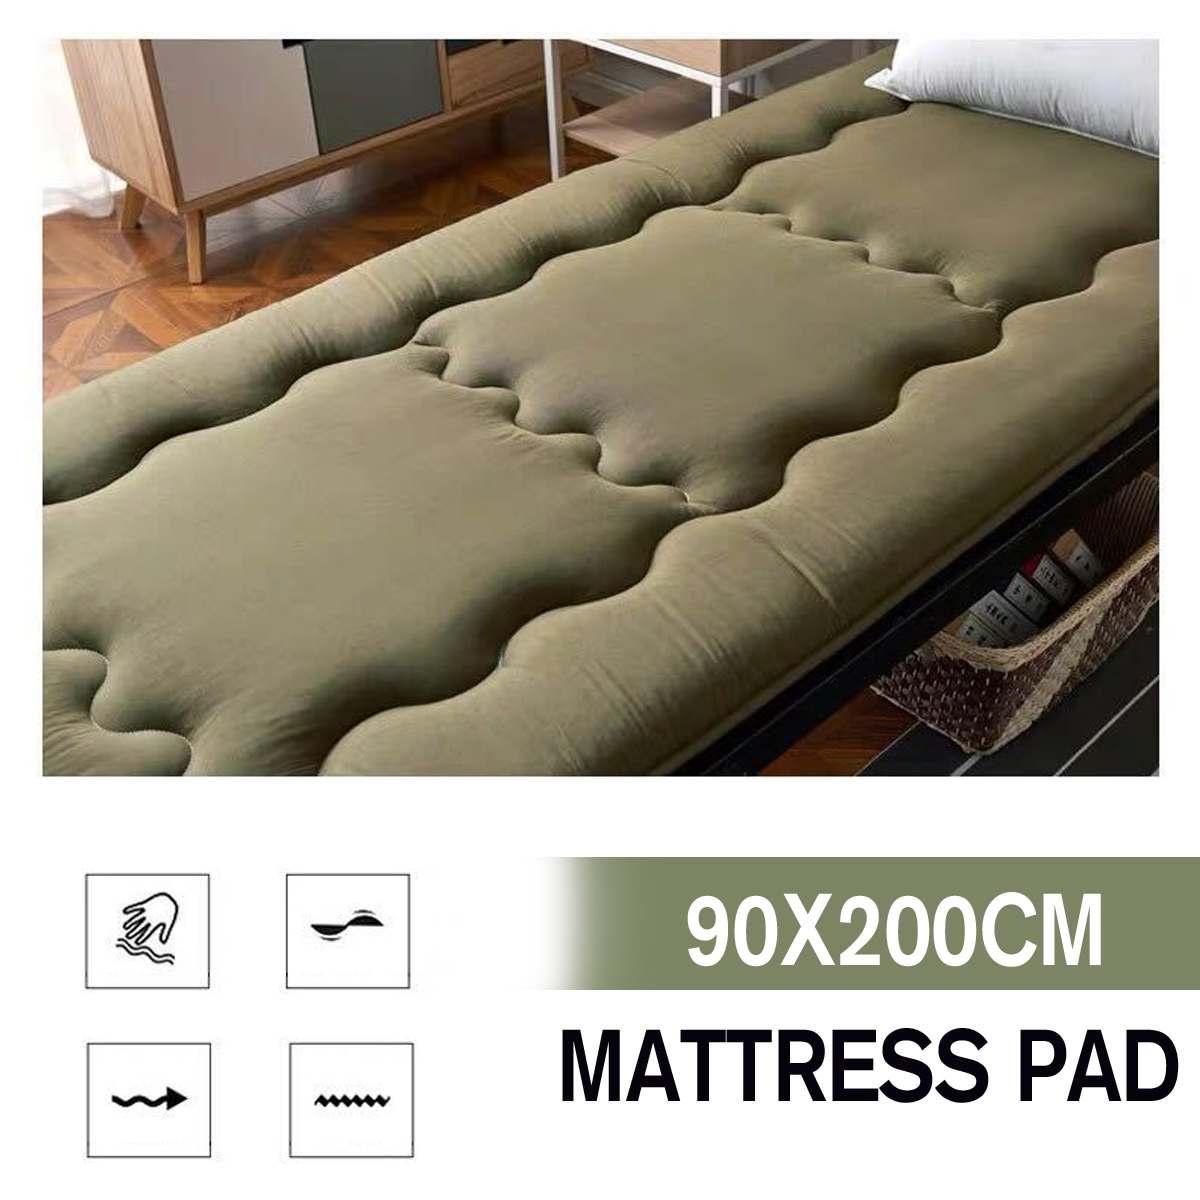 90x200cm Mattress Ergonomic Thickness Foldable Student Dormitory Mattresses Cotton Cover Tatami Single Bed Size